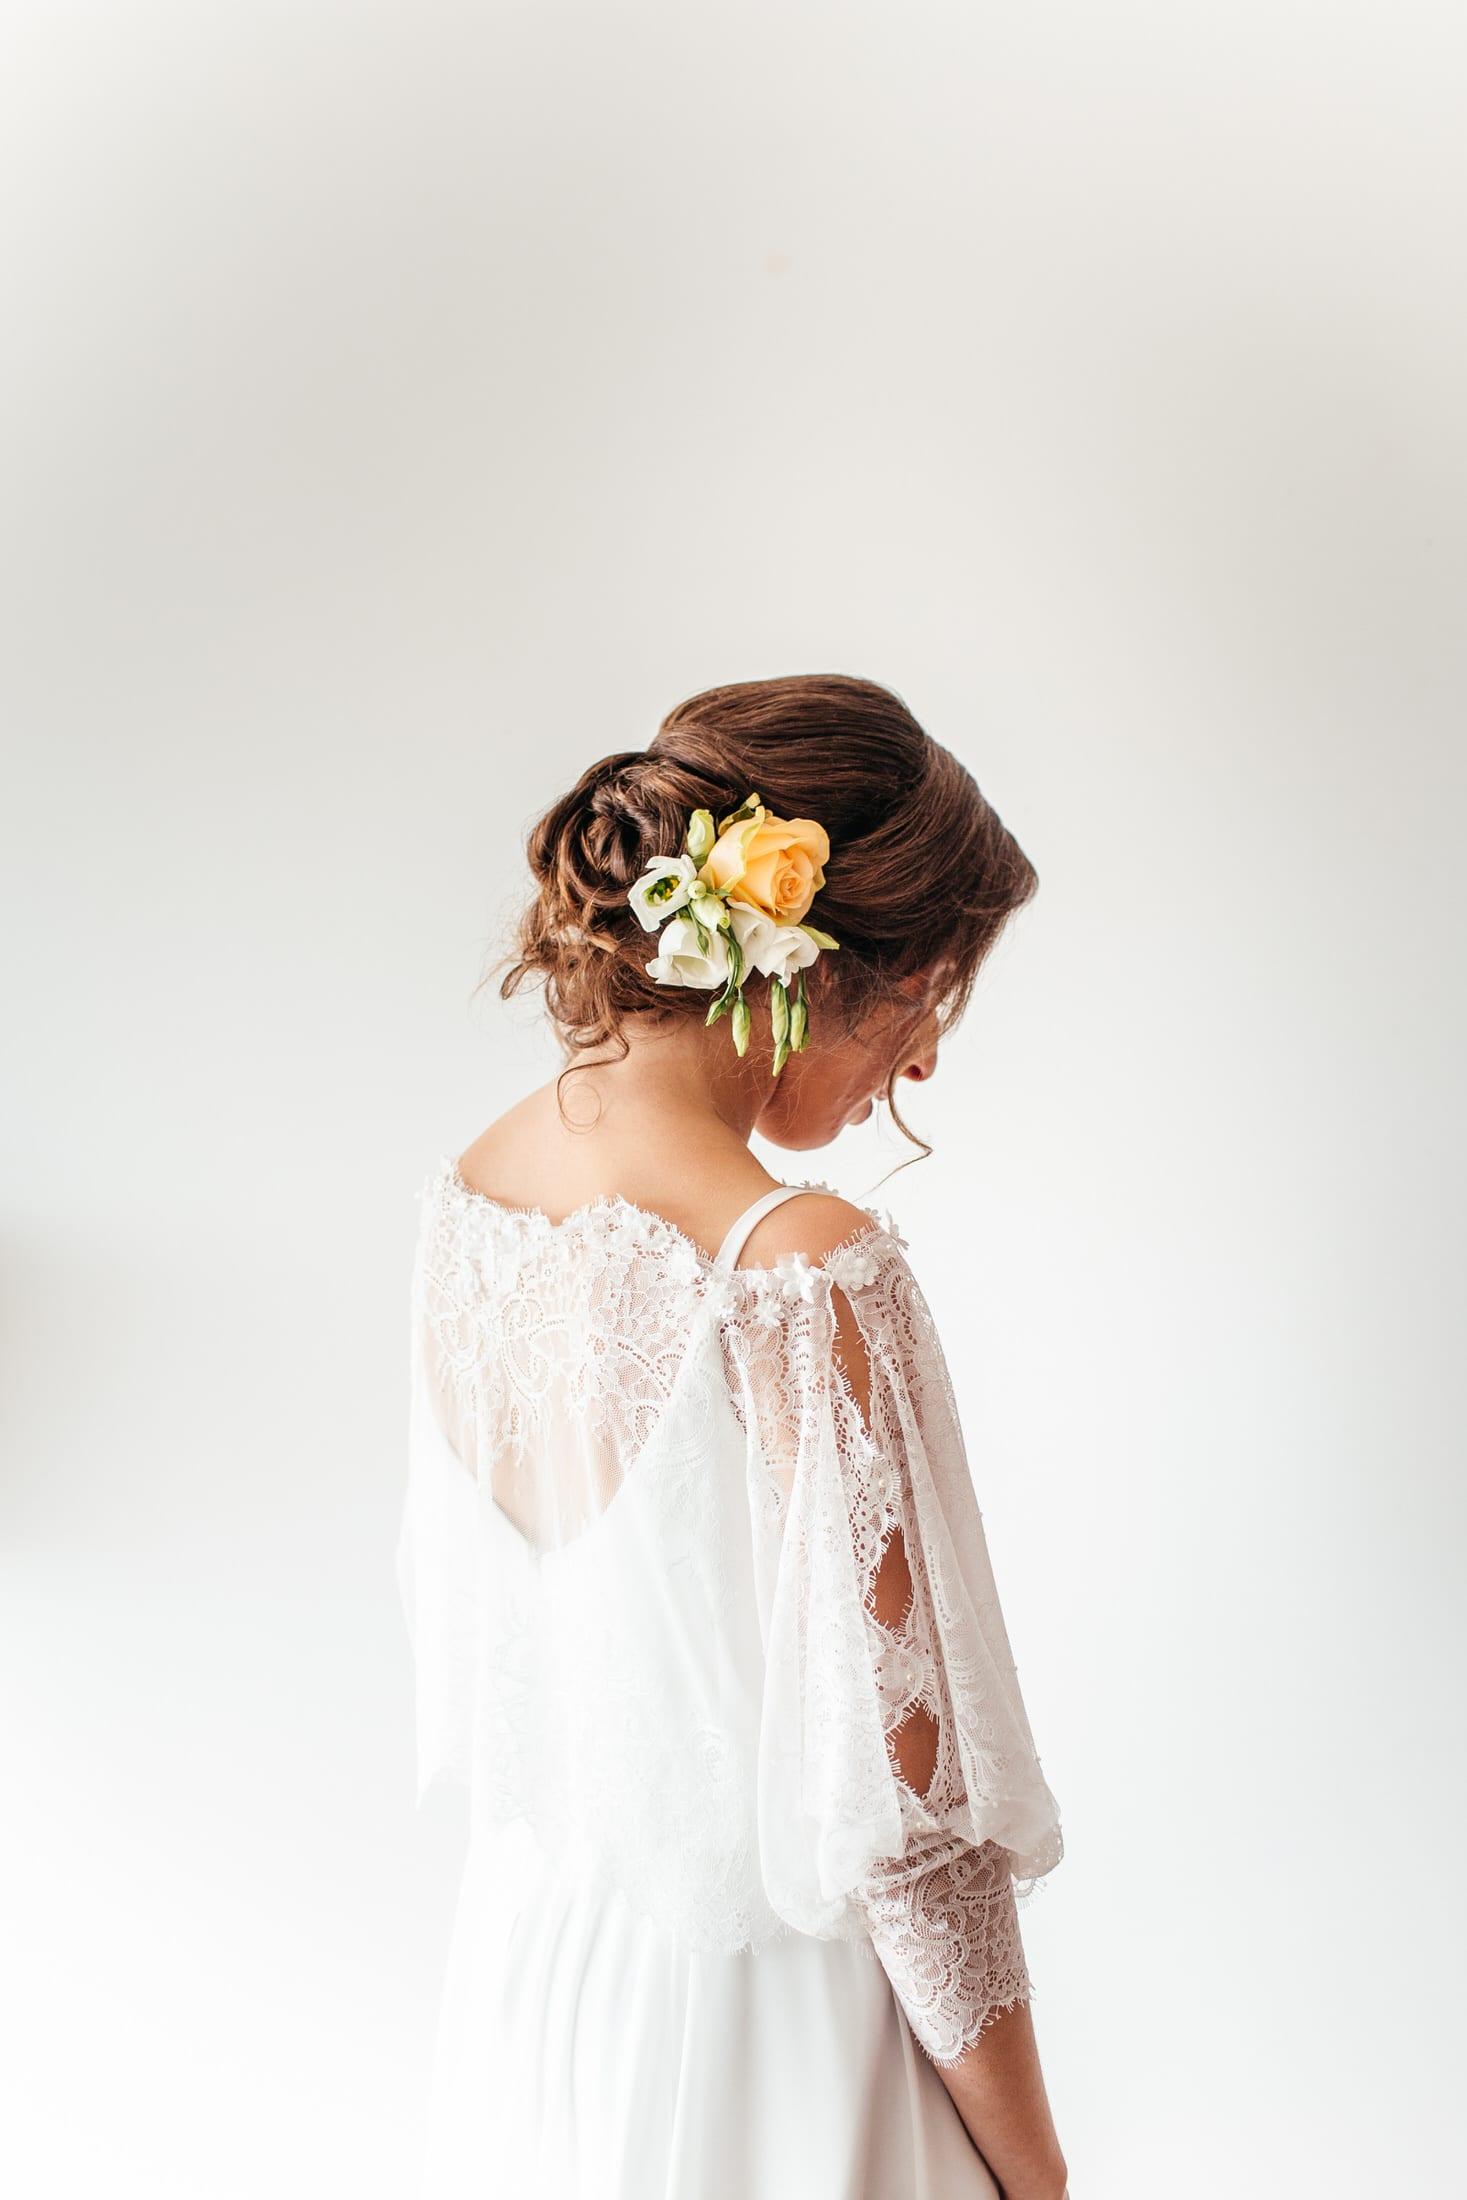 Portuguese wedding photographer